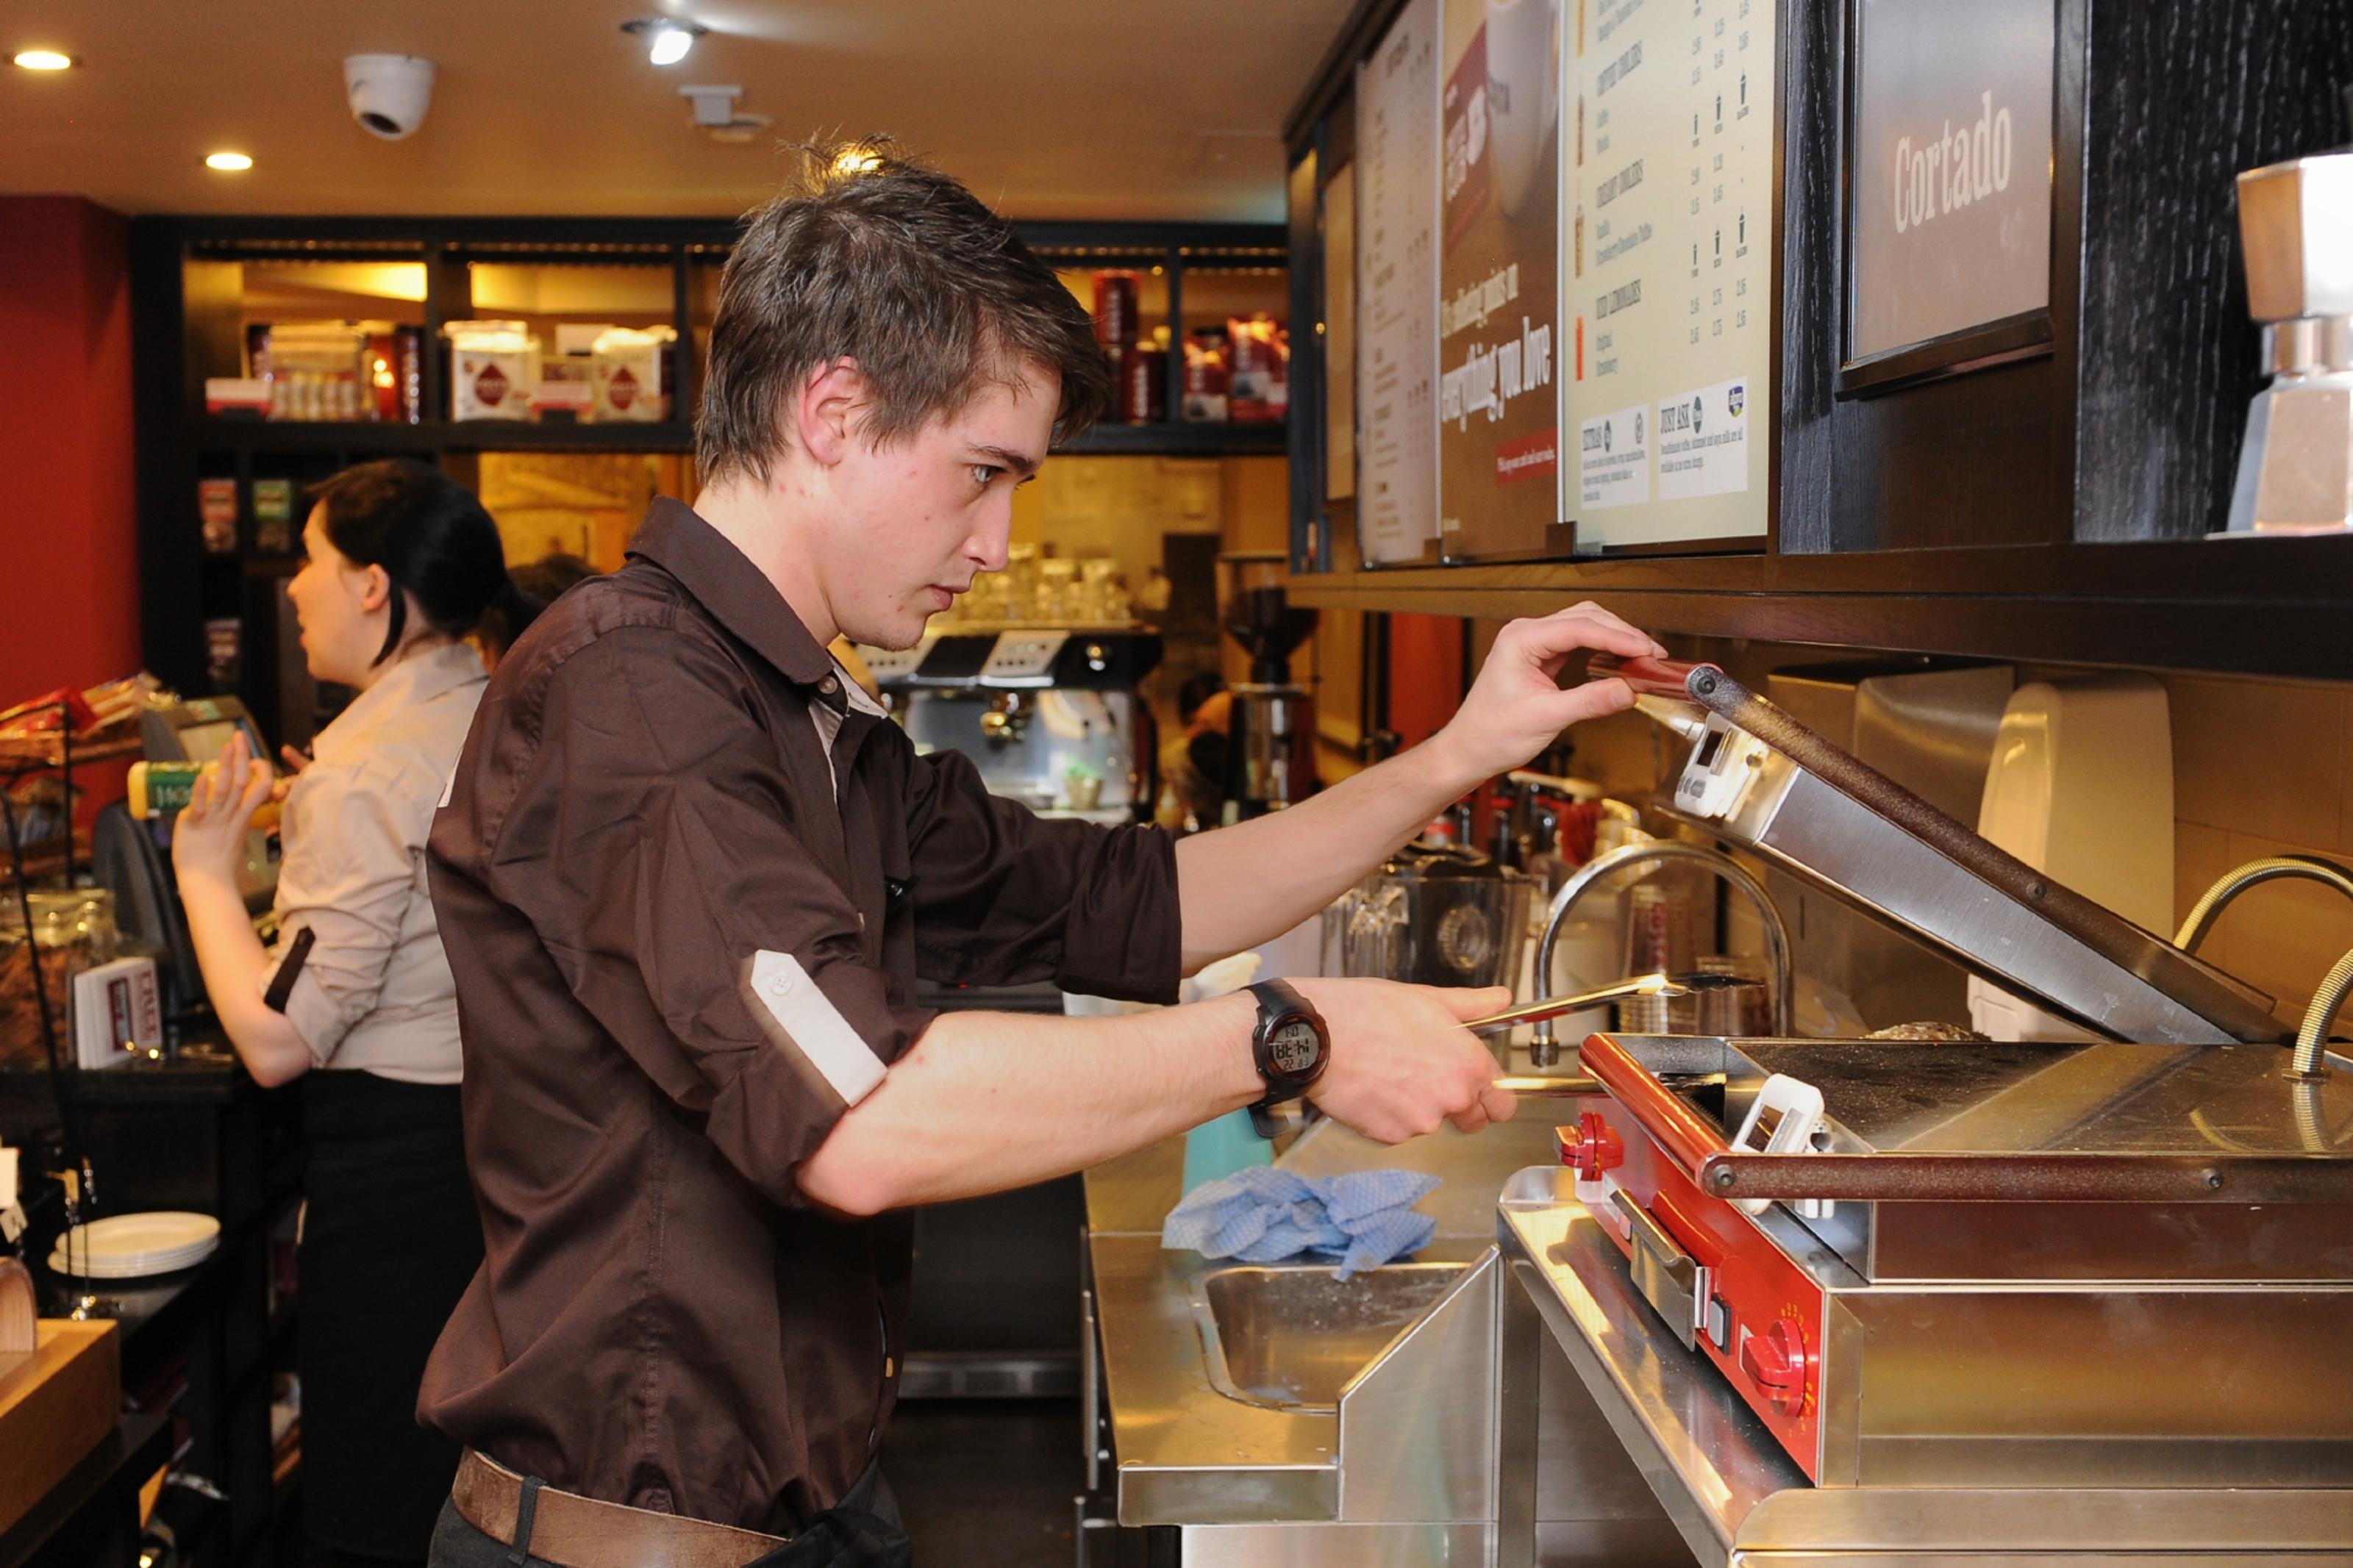 A Costa worker